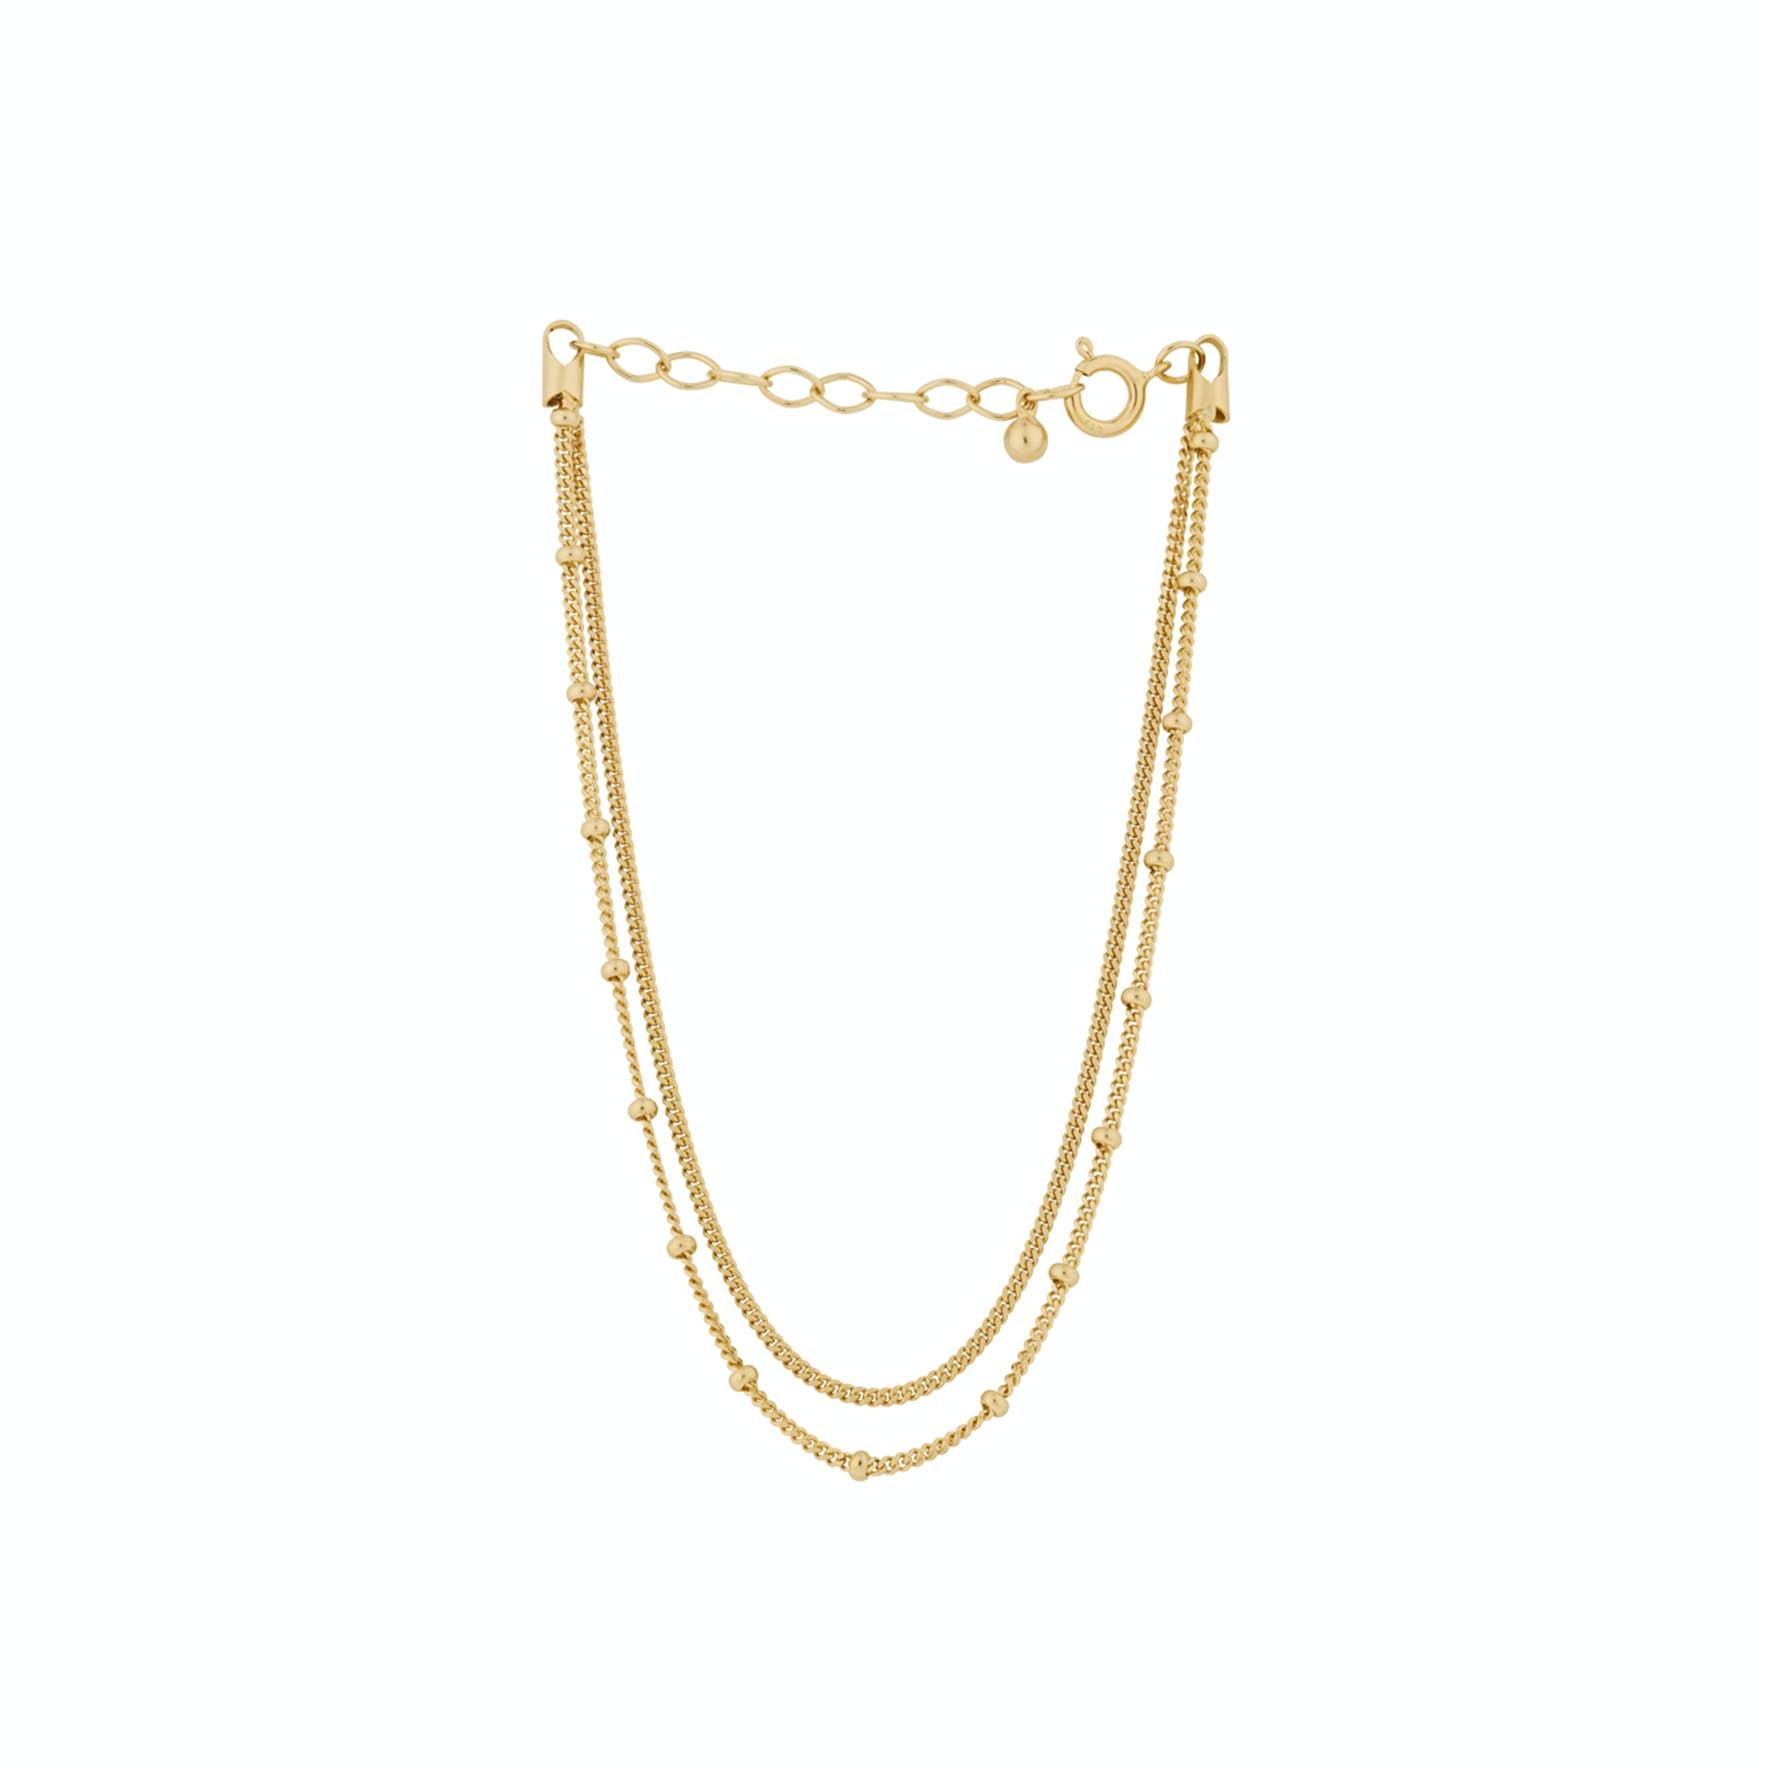 Galaxy Bracelet von Pernille Corydon in Vergoldet-Silber Sterling 925